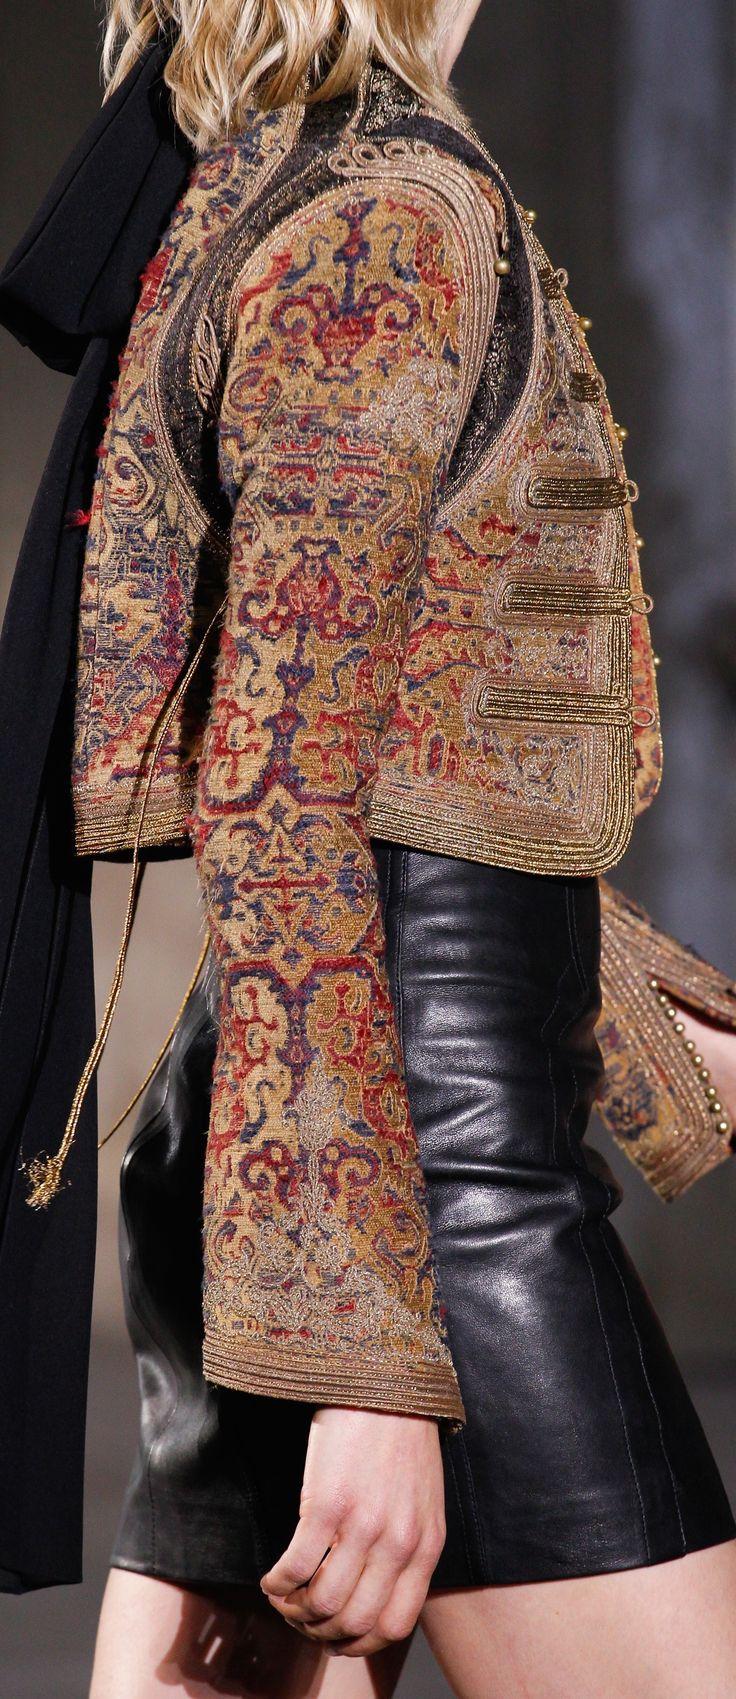 Saint Laurent S-17 RTW: tapestry military jacket, leather skirt.